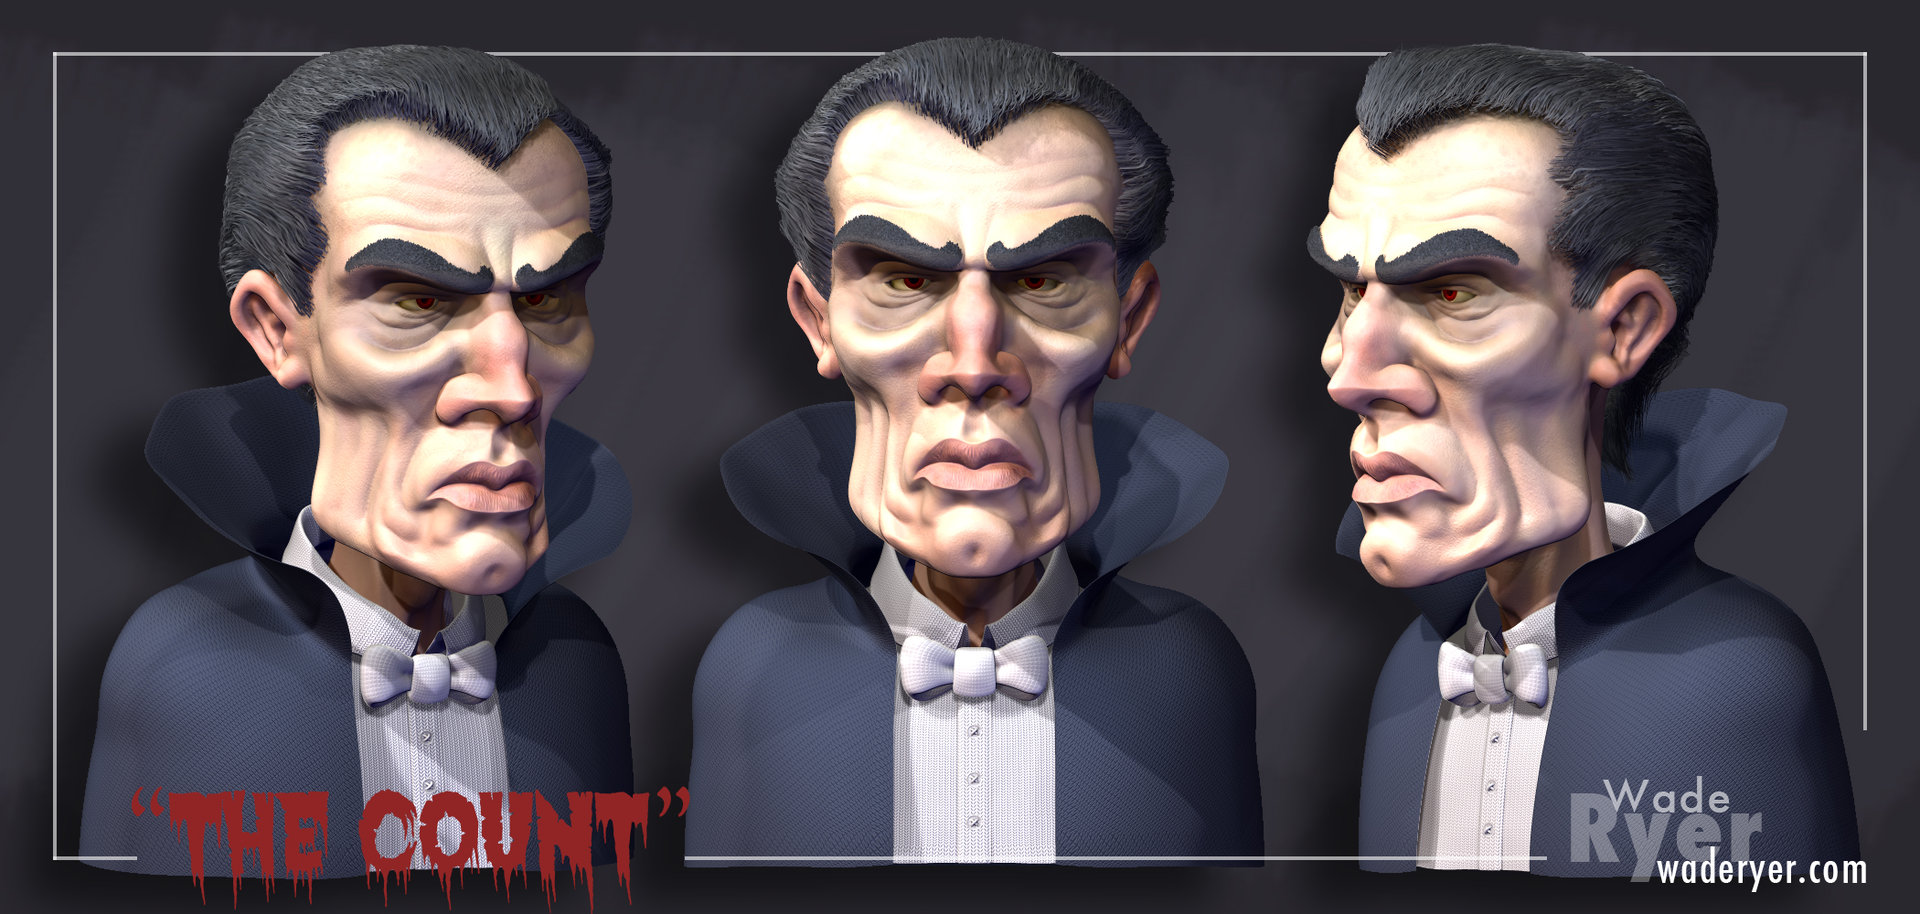 Dracula layout